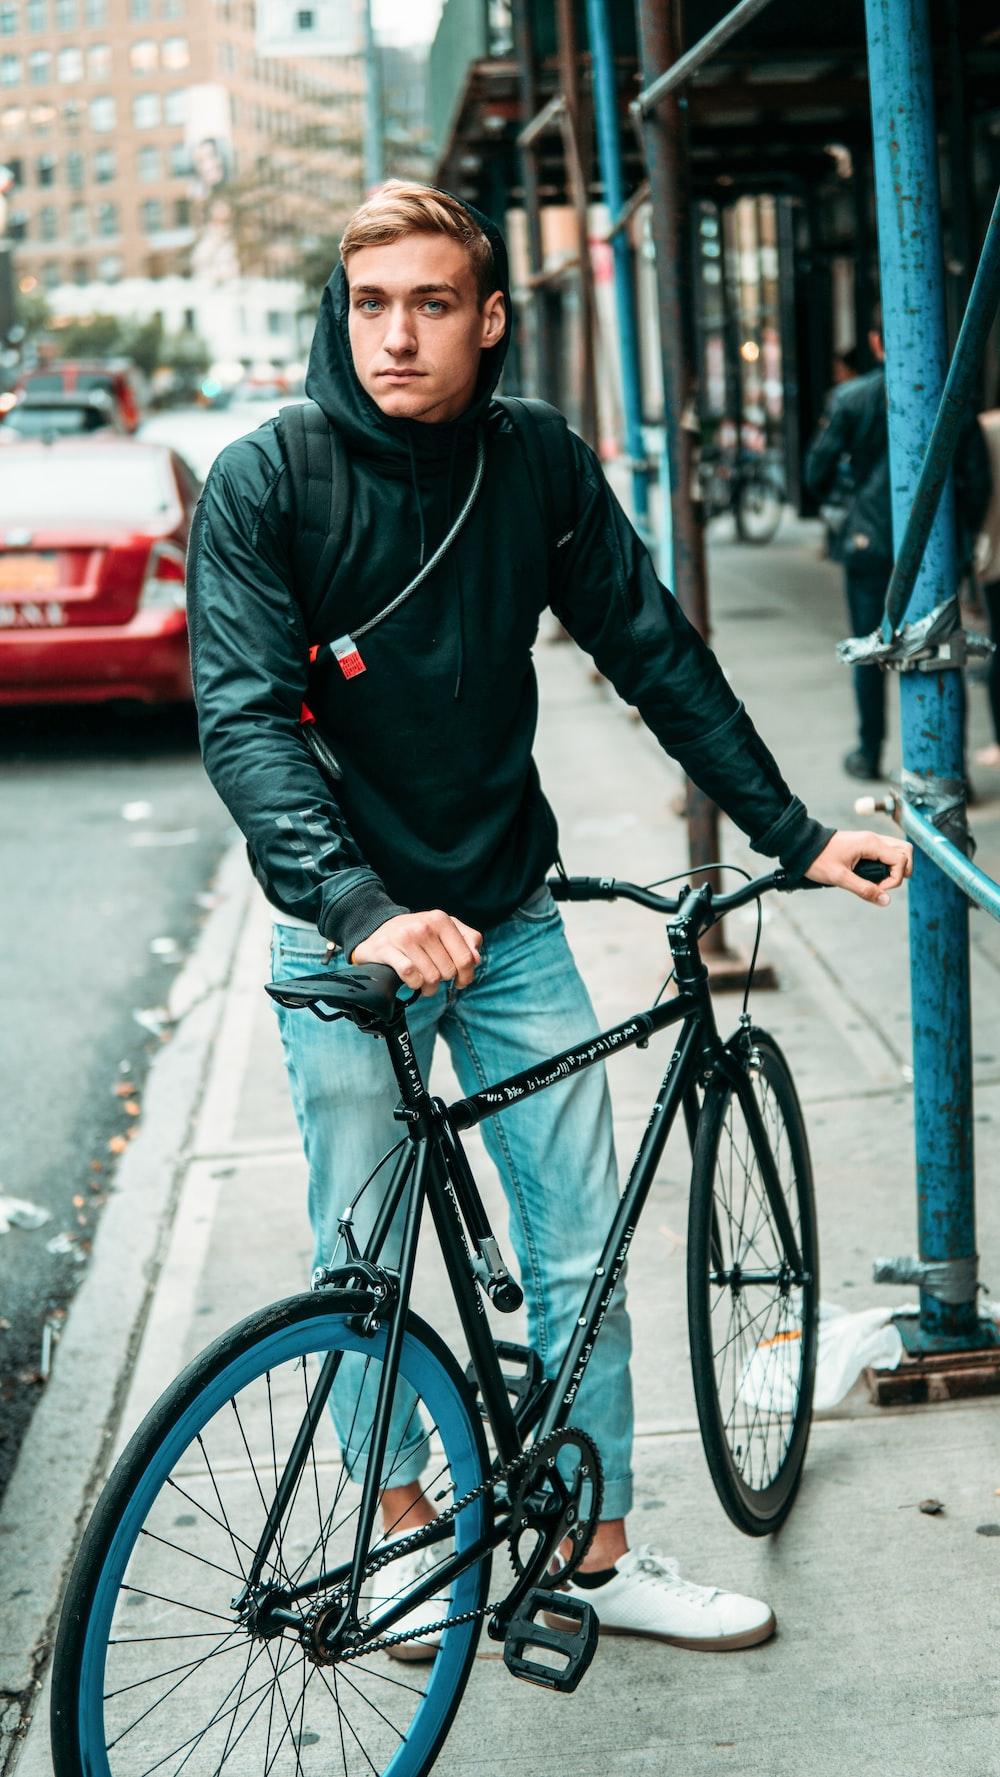 man in black hoodie and blue denim jeans riding on black bicycle